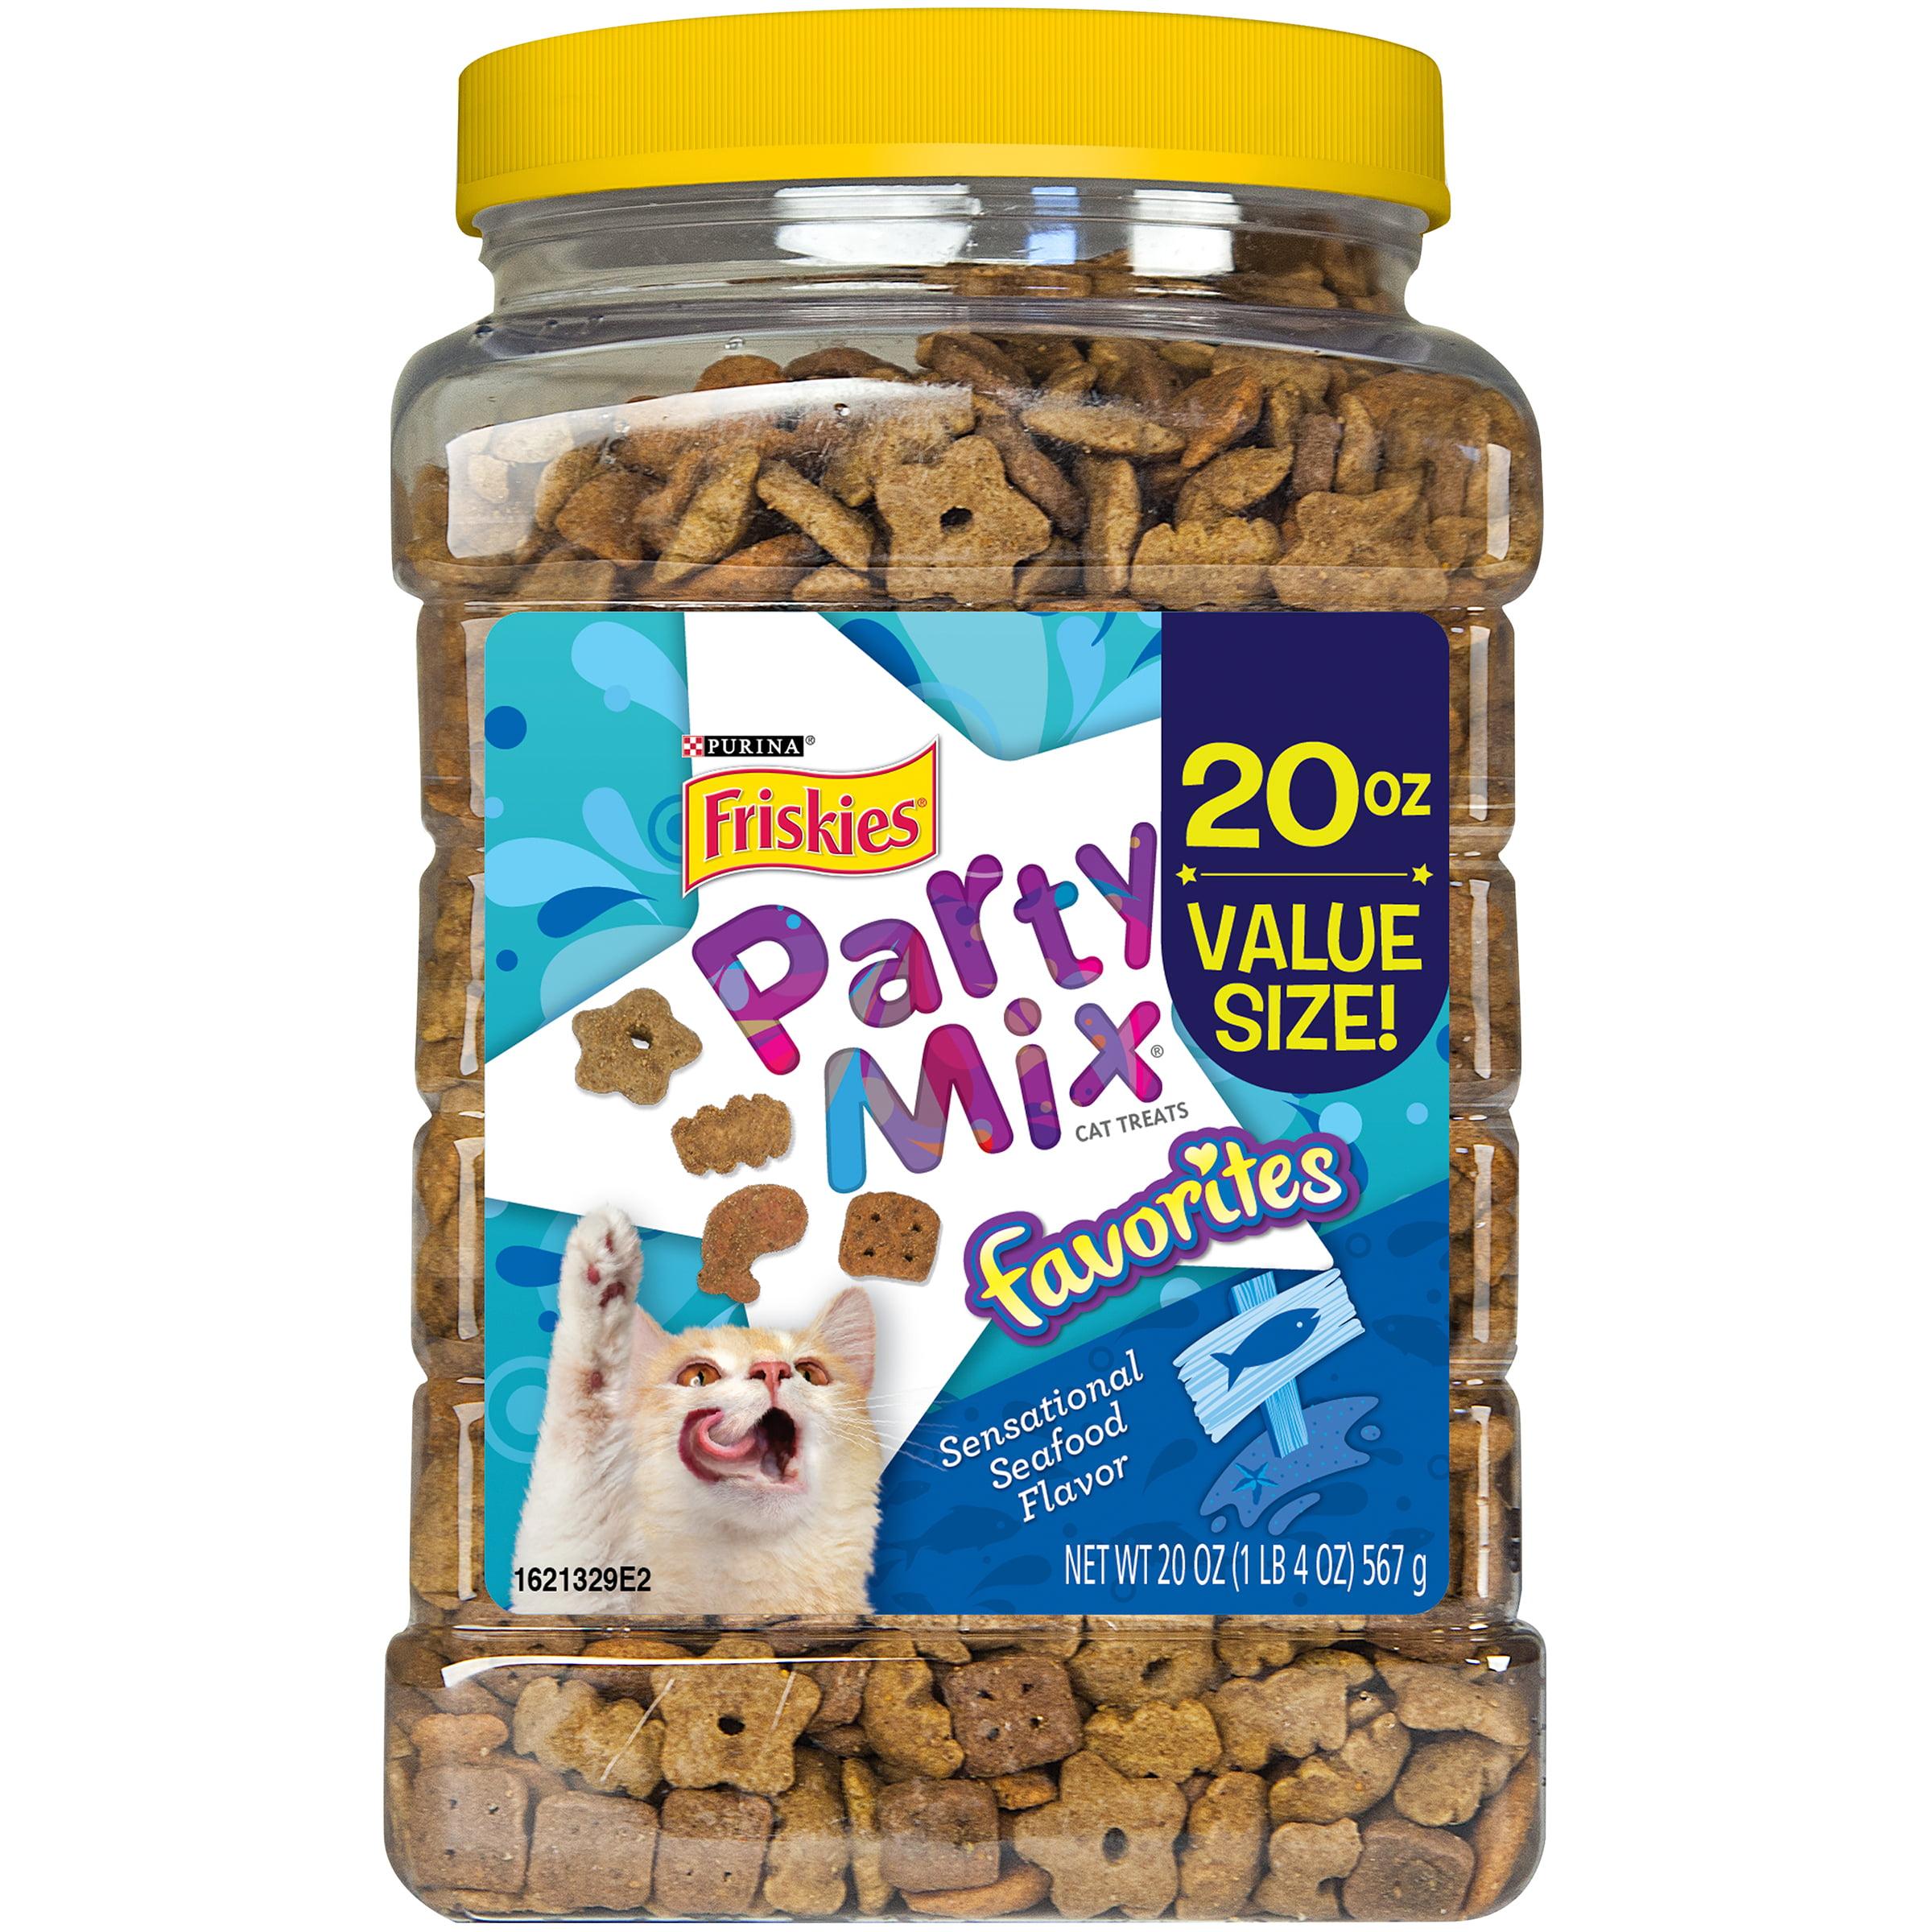 Purina Friskies Party Mix Favorites Sensational Seafood Flavor Dry Cat Treats, 20 Oz. by Nestle Purina